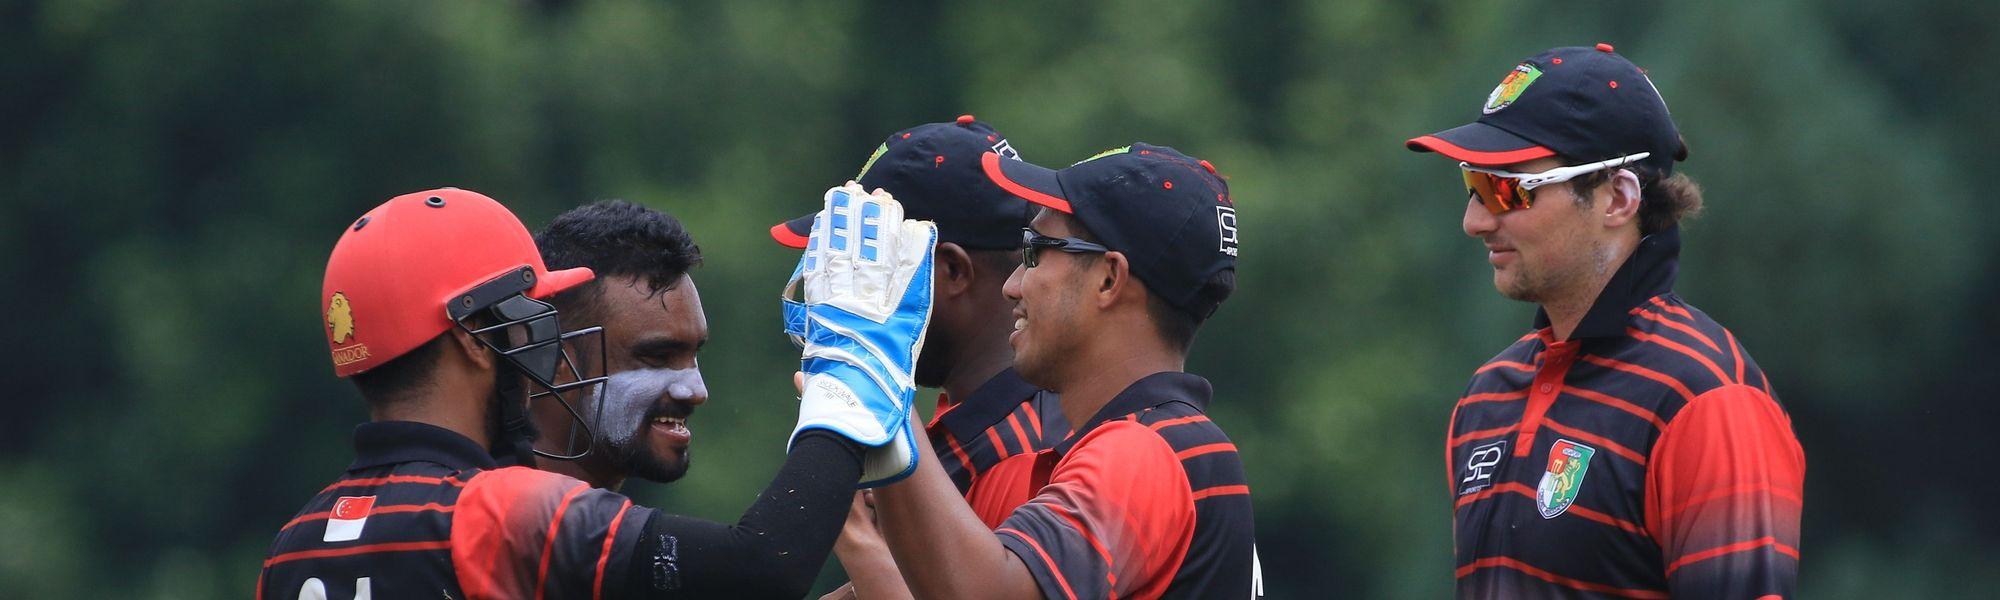 Singapore players celebrates upon dismissing Rodrigo Thomas of Canada.JPG